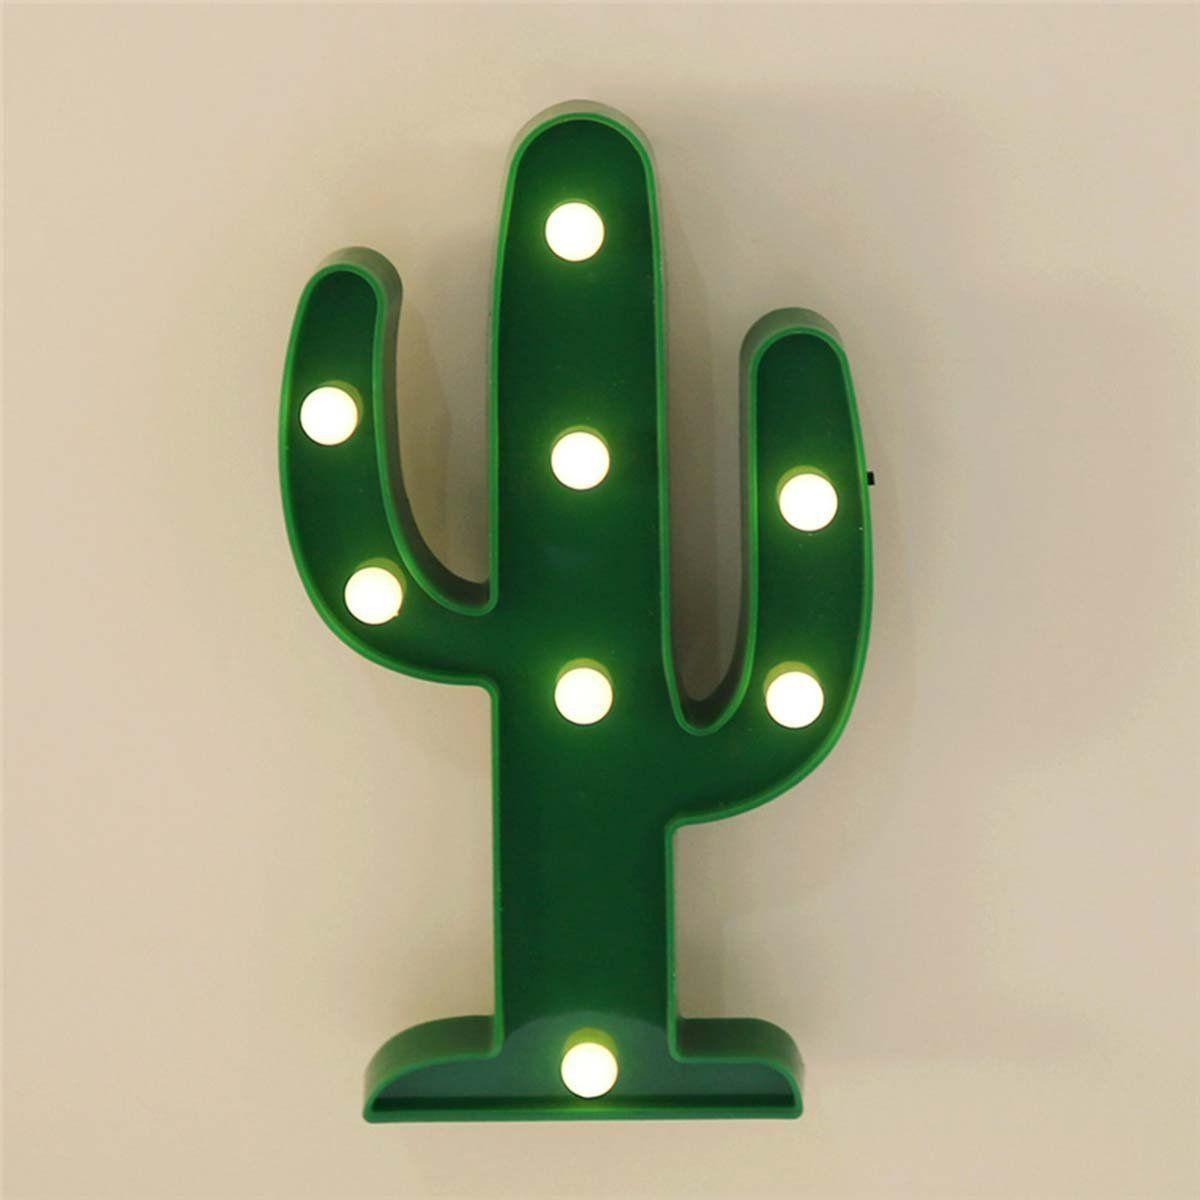 Led Lights For Room Decoration Amazon